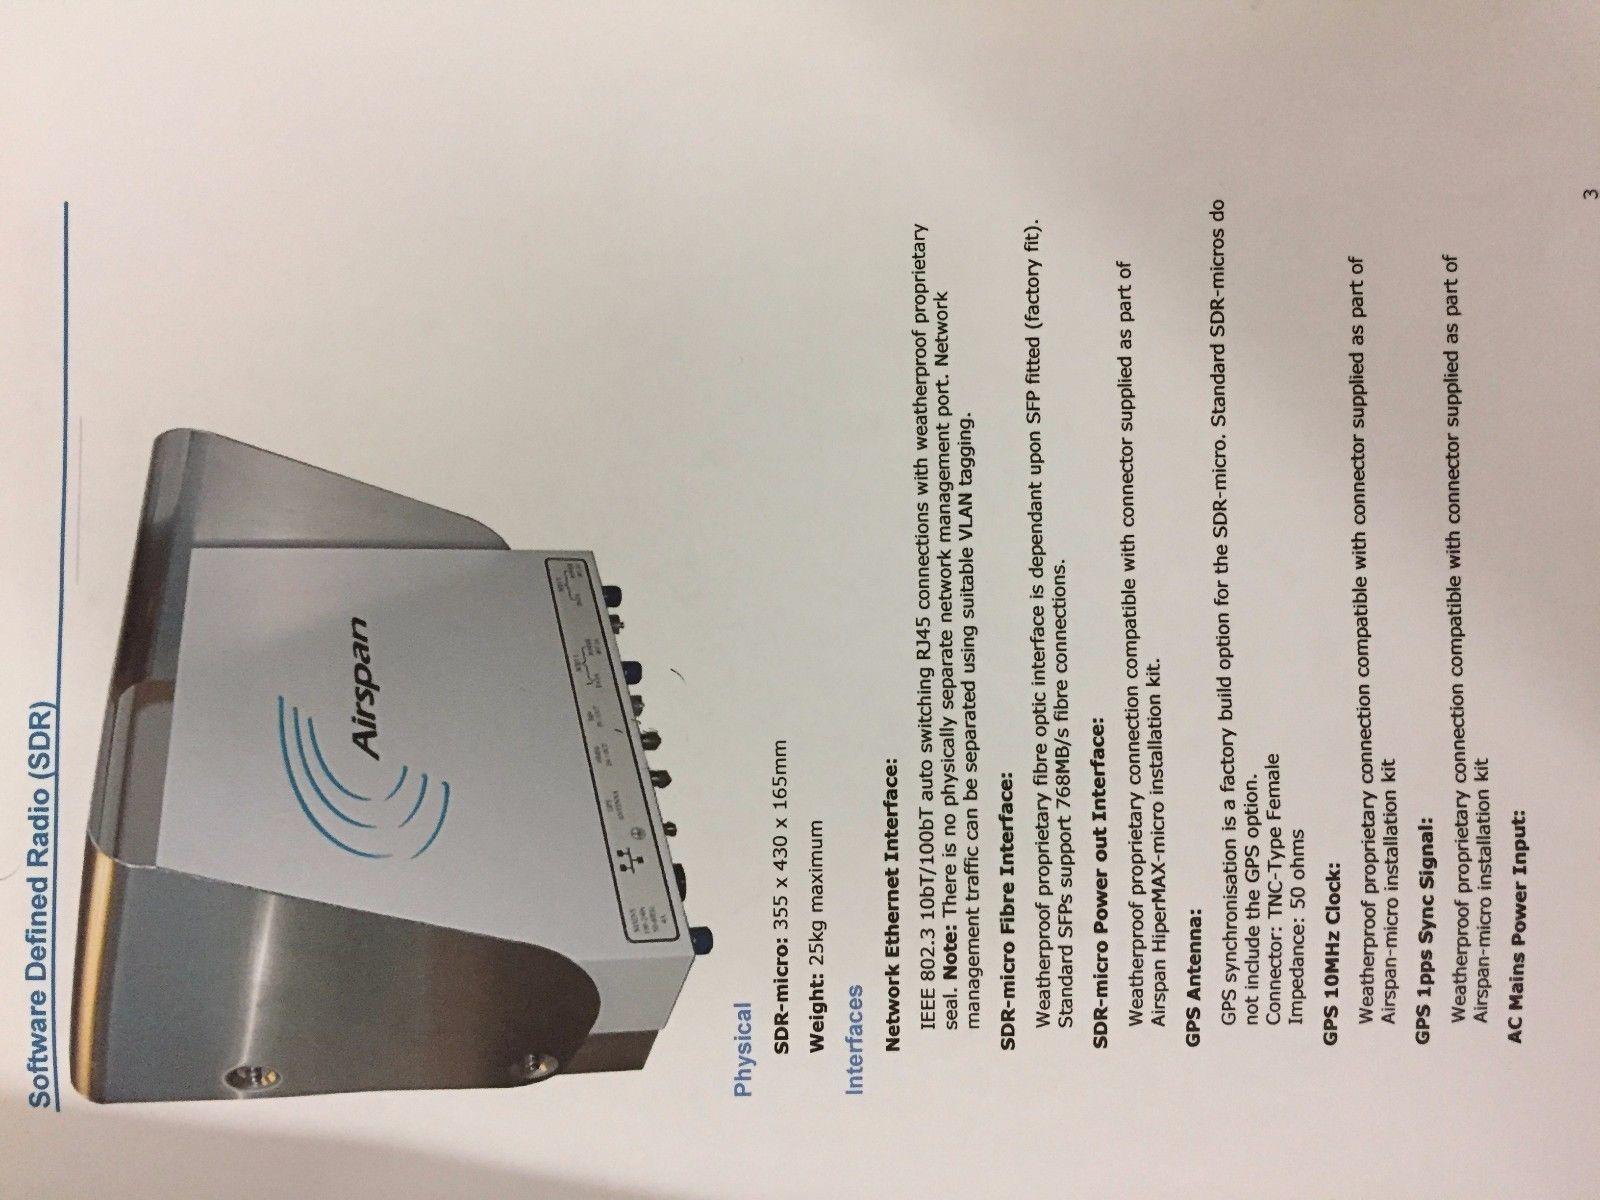 Airspan Max IP-BASED Broadband Wireless and 50 similar items